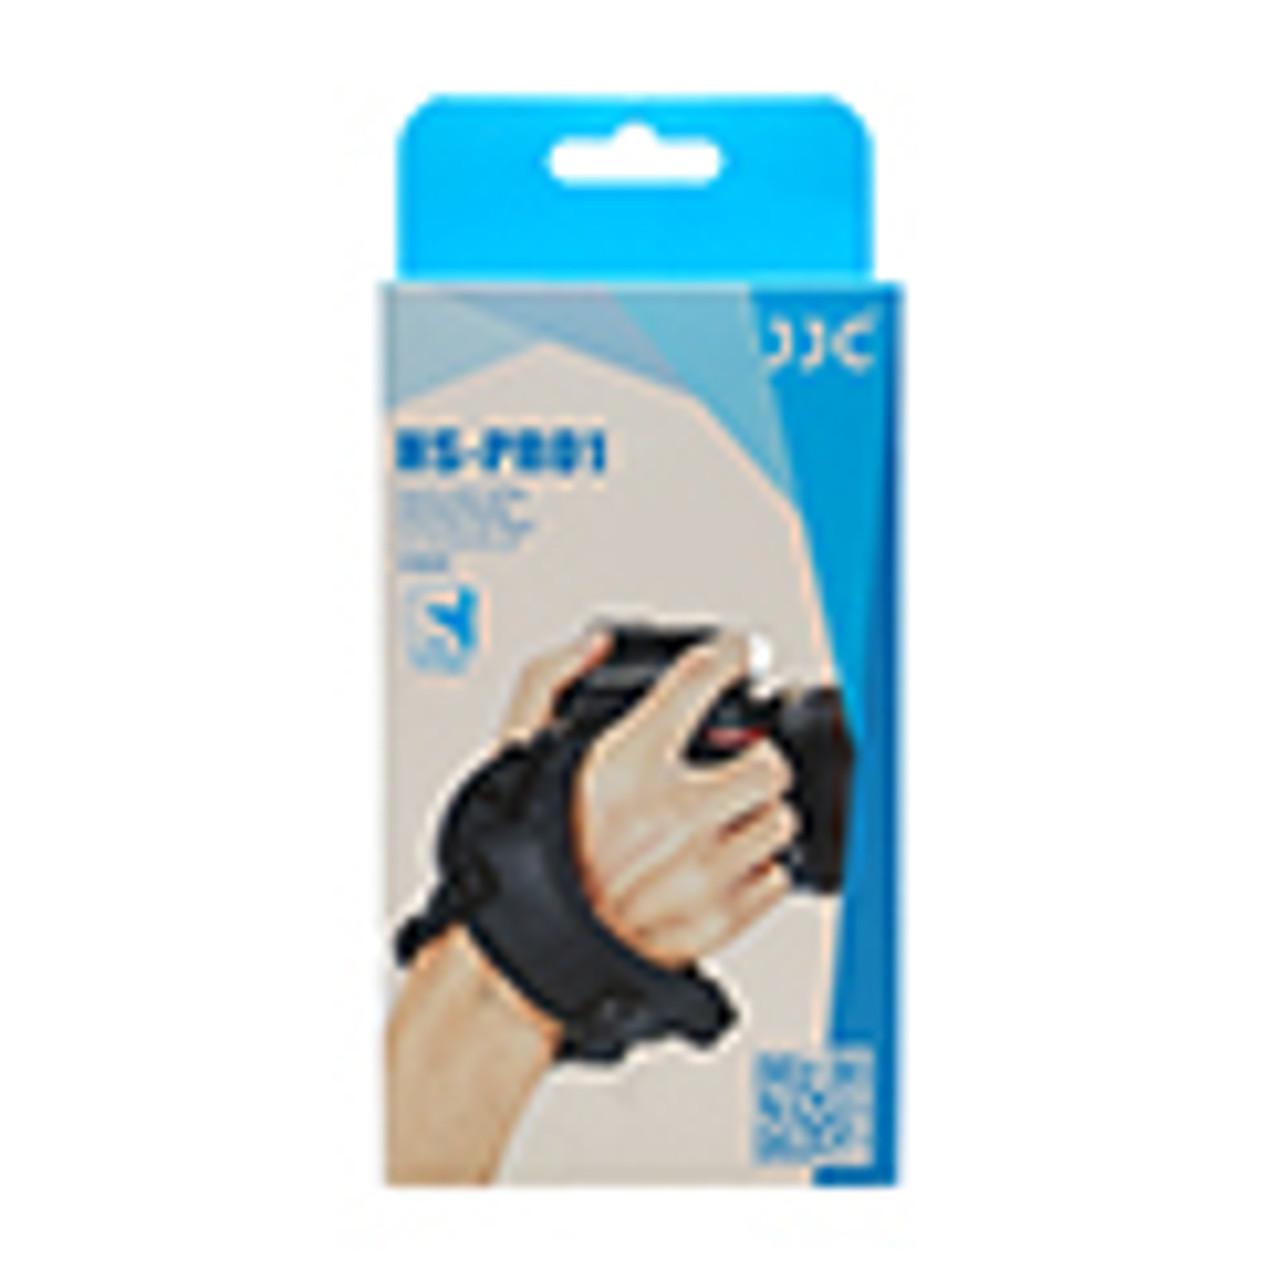 JJC Hand Grip Strap